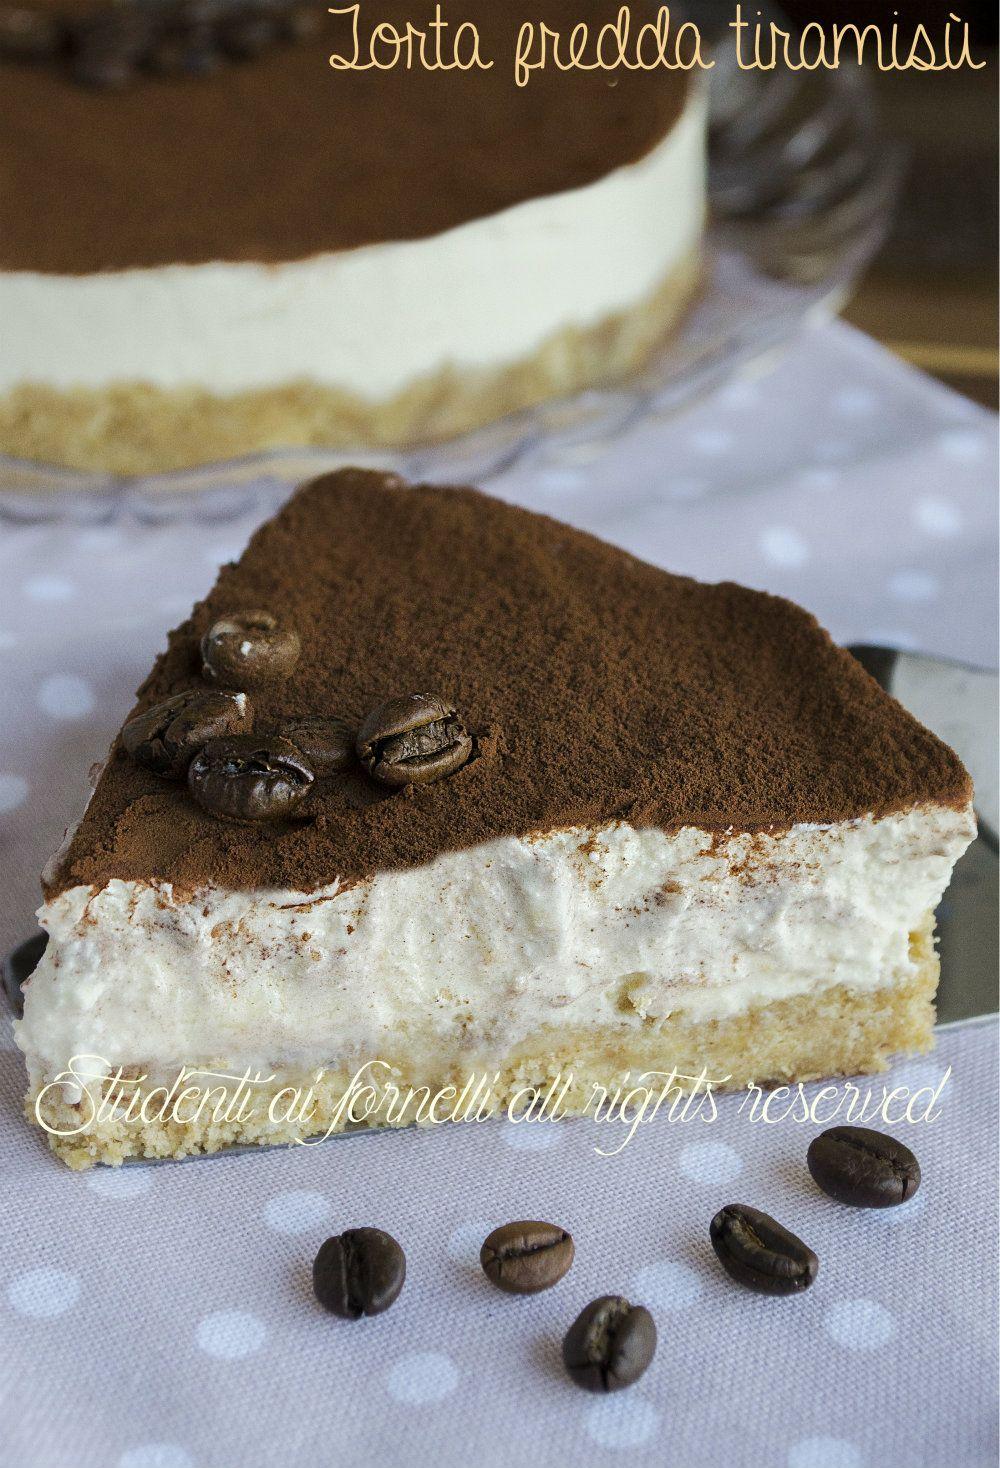 3eb20cc4b5ce67f9312c9c07d4559307 - Ricette Cheesecake Fredda